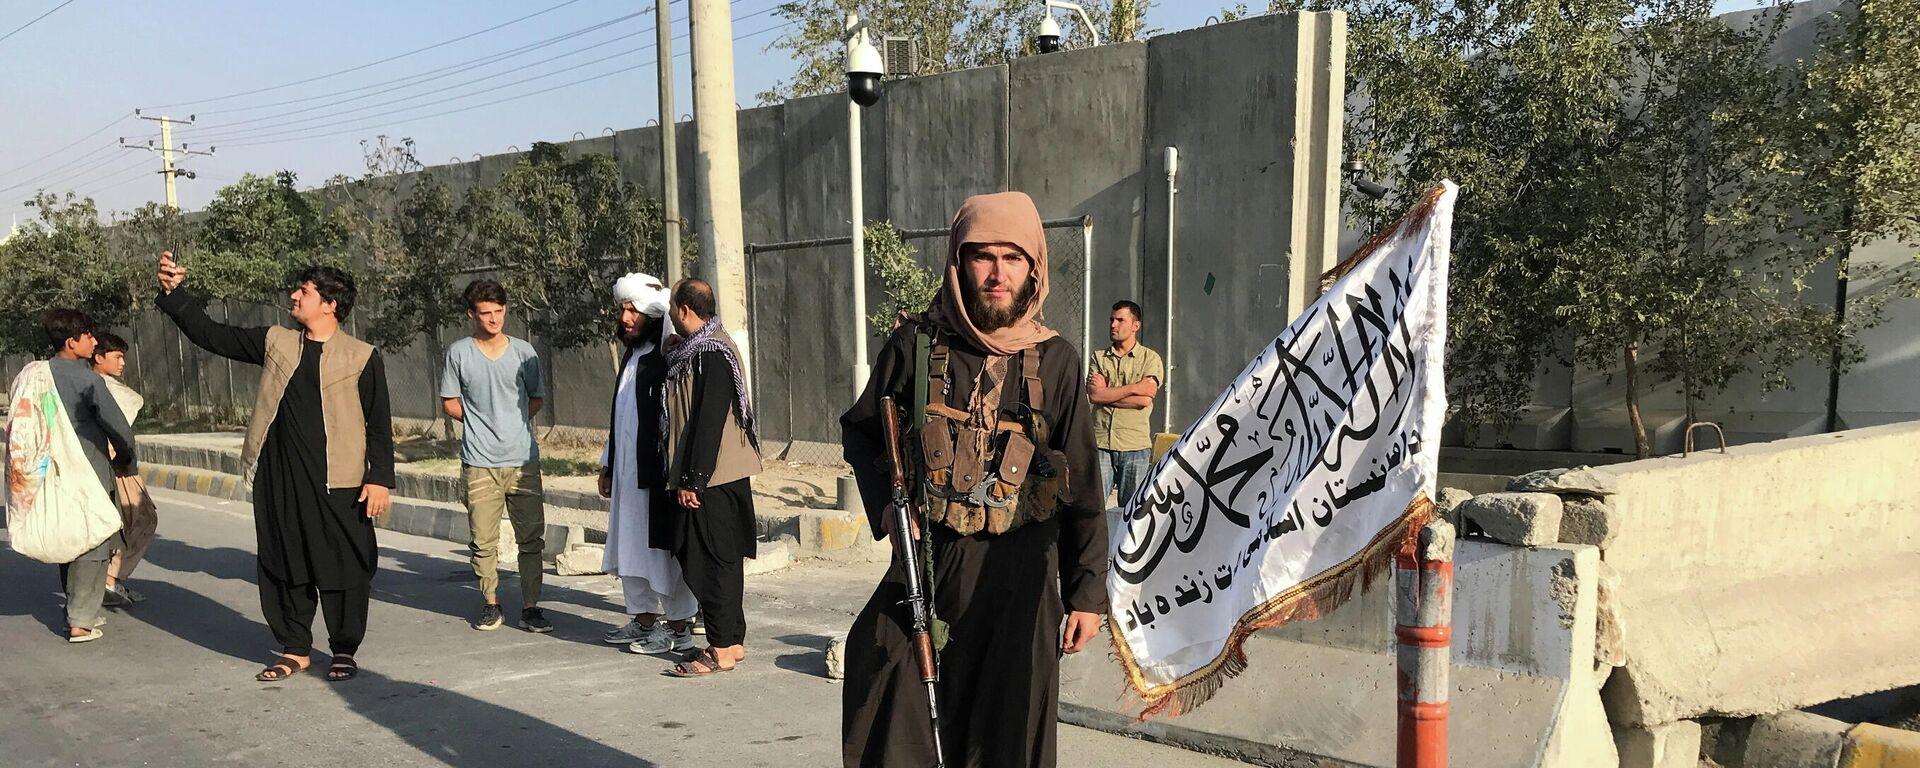 Talibanes en Kabul, Afganistán - Sputnik Mundo, 1920, 07.09.2021